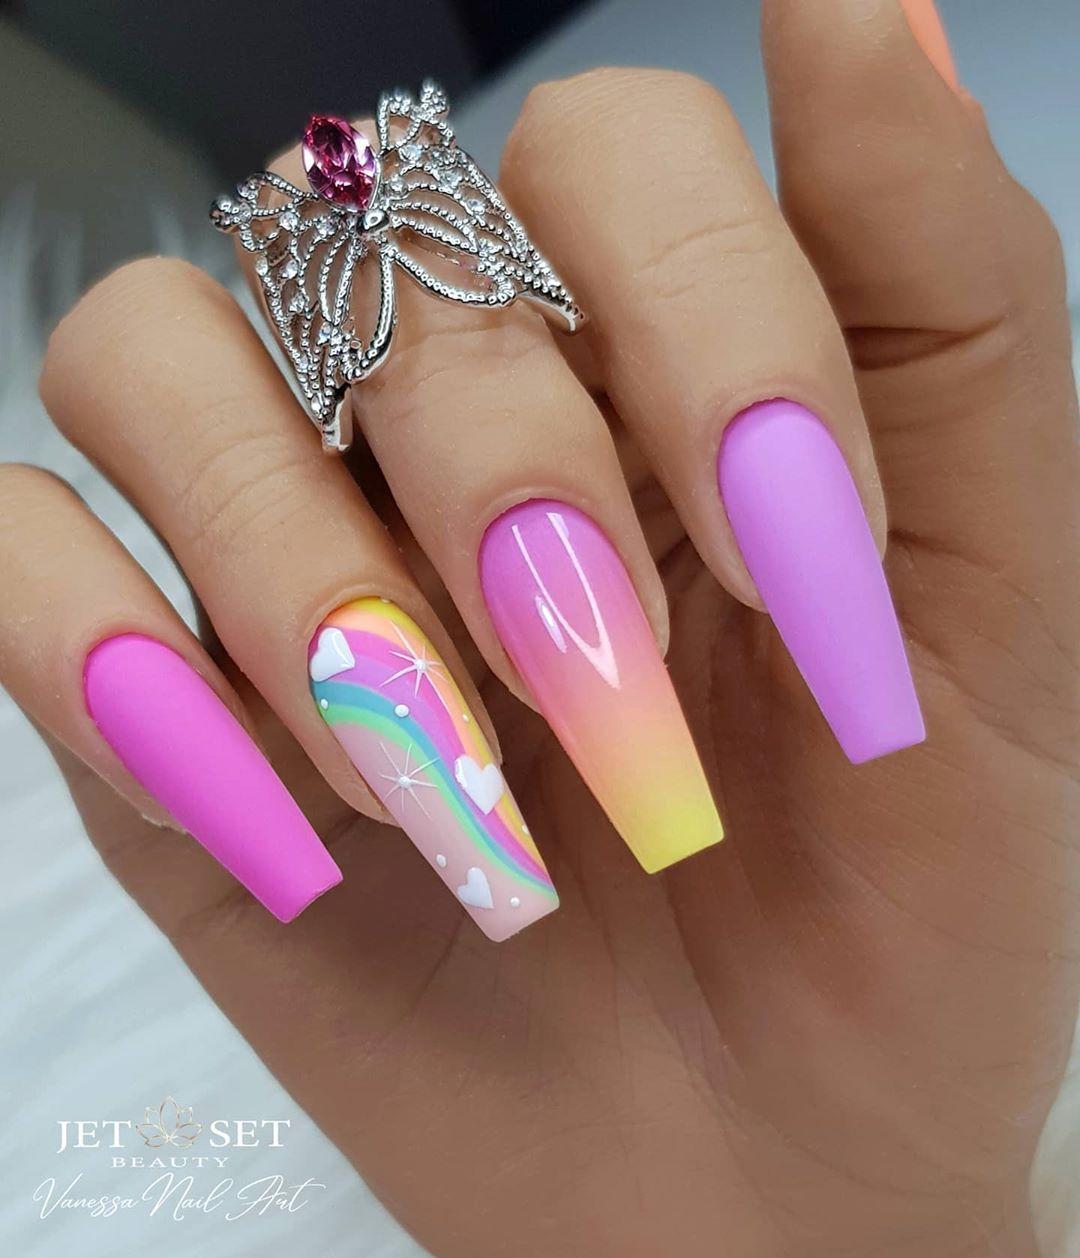 "Vanessa Nail Art on Instagram: ""Spring Rainbow Nails🌈 Products @jet_set_beauty_nails #nailstagram #nailsofinstagram #nails💅 #nailpro #nailporn #nailswag #glitternails…"""